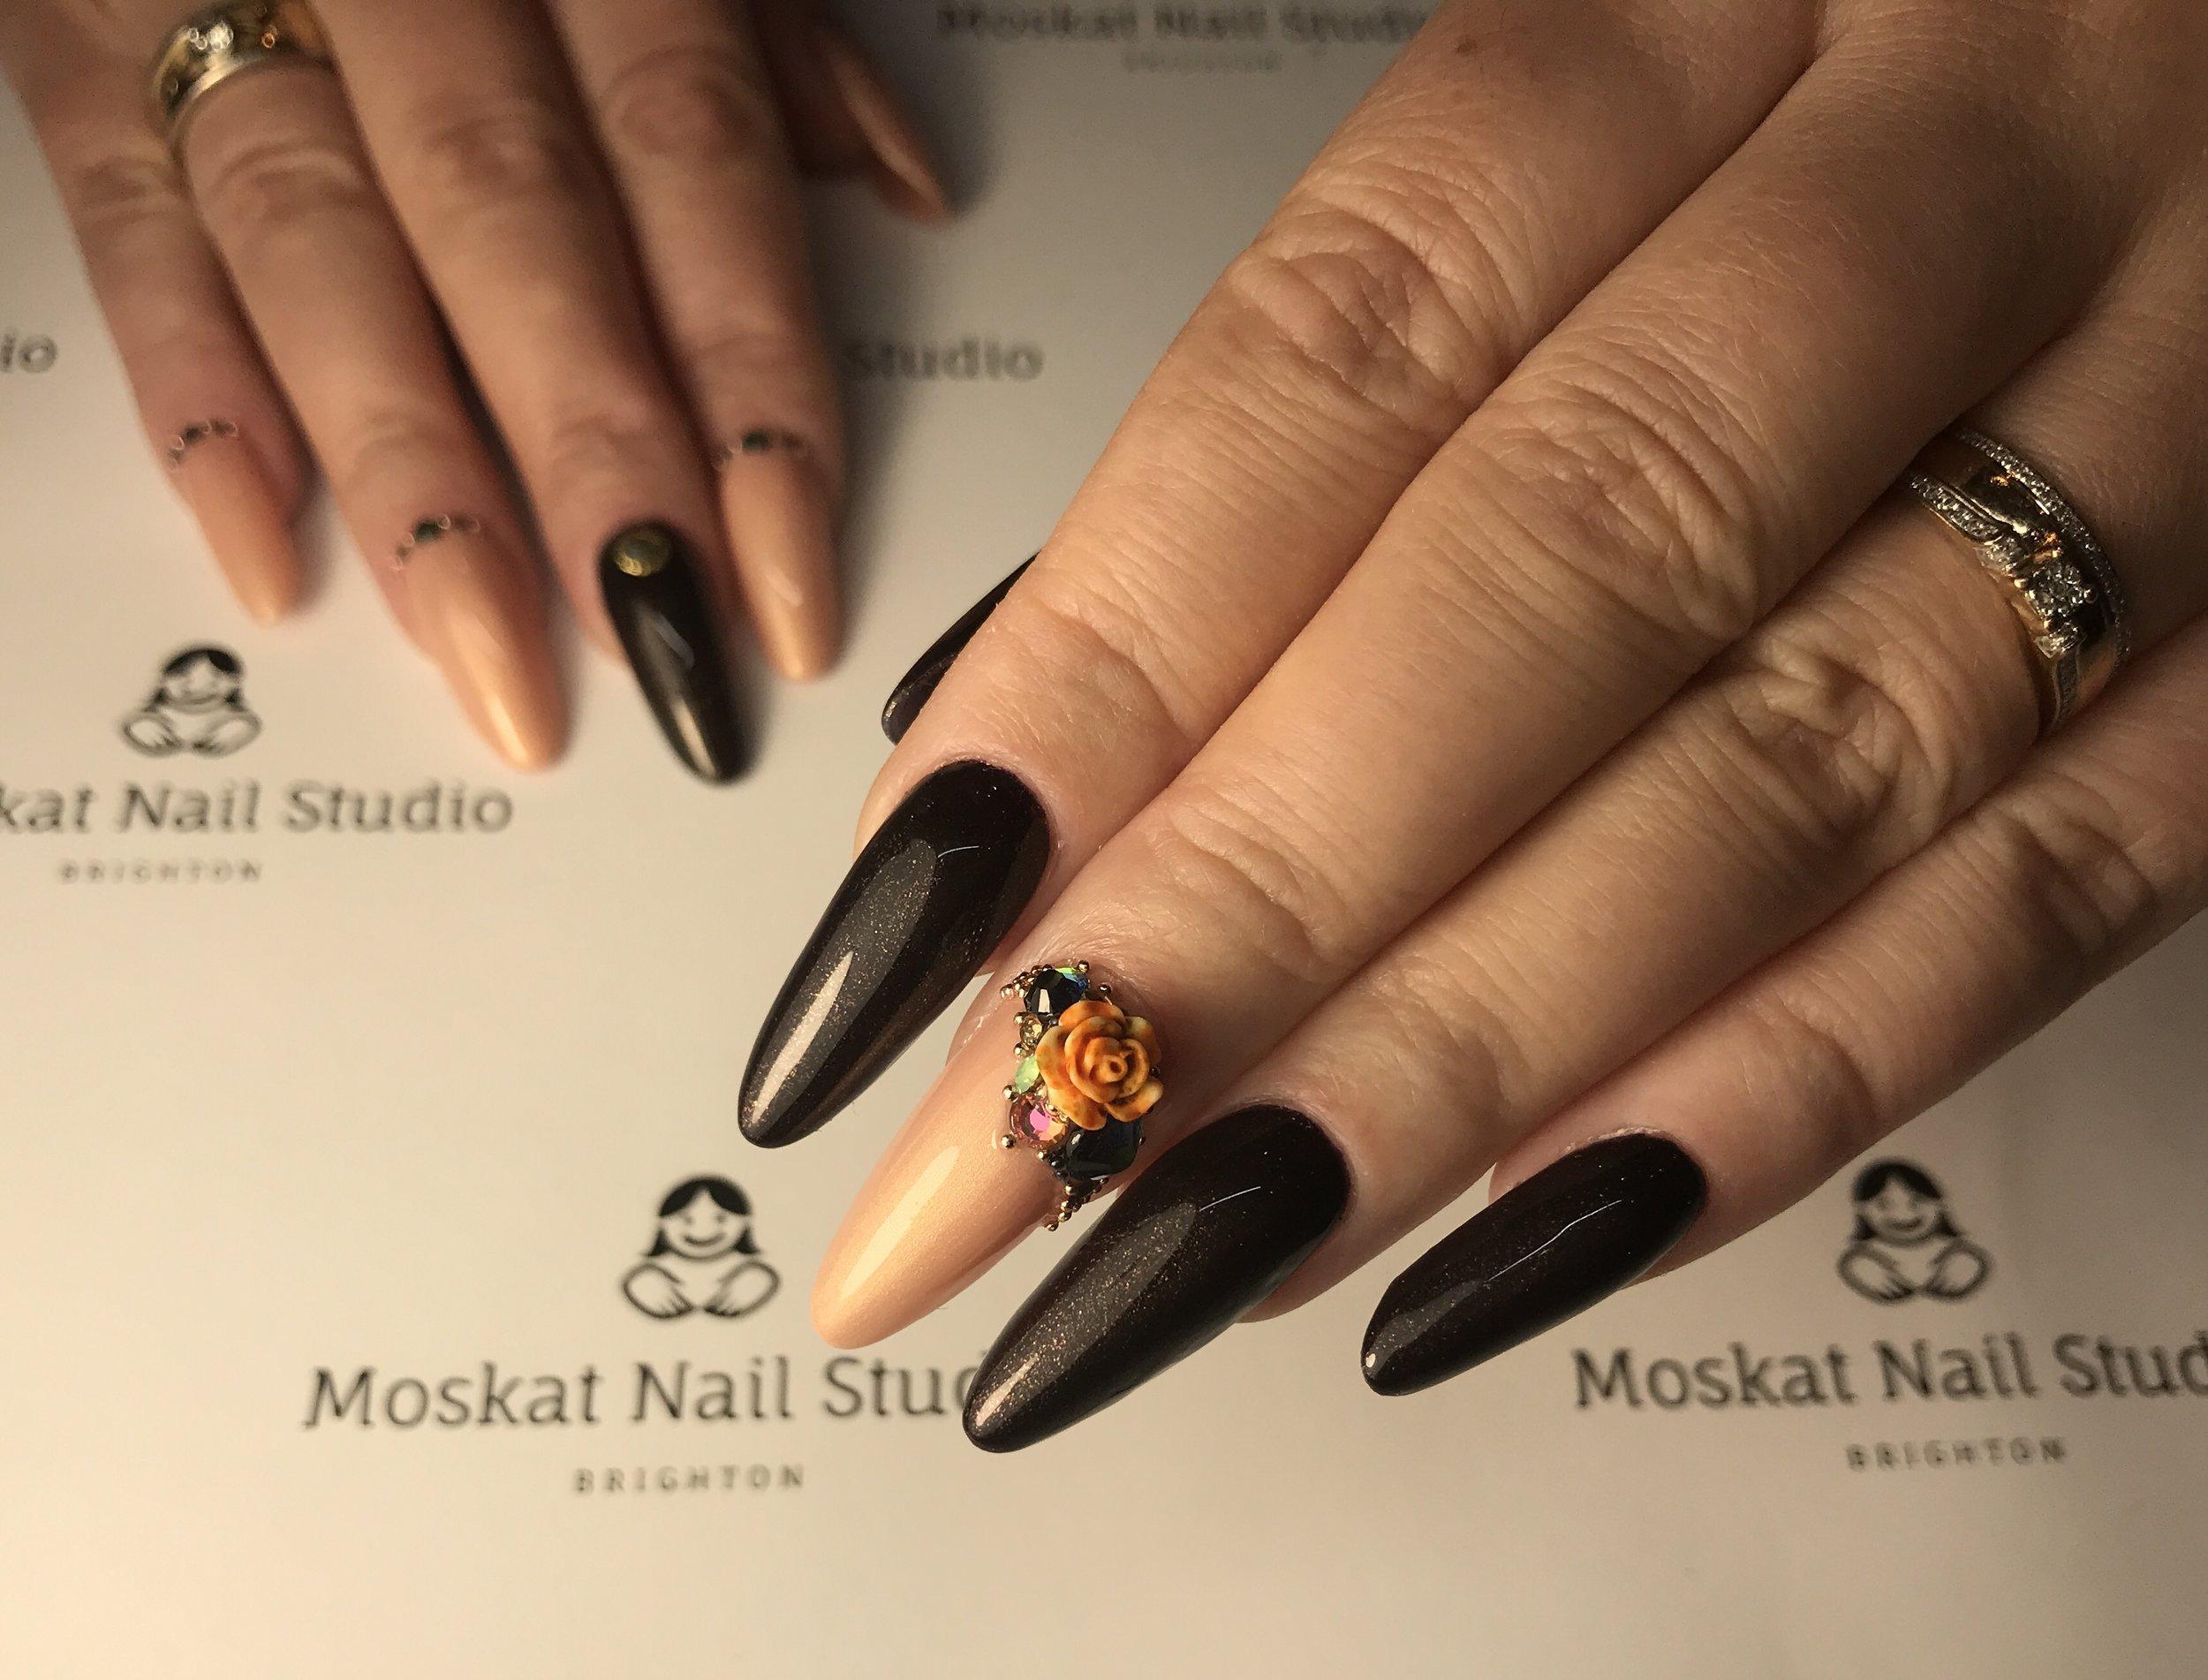 Acrylic, Gel & PolyGel Nails in Brighton — Moskat Nail Studio